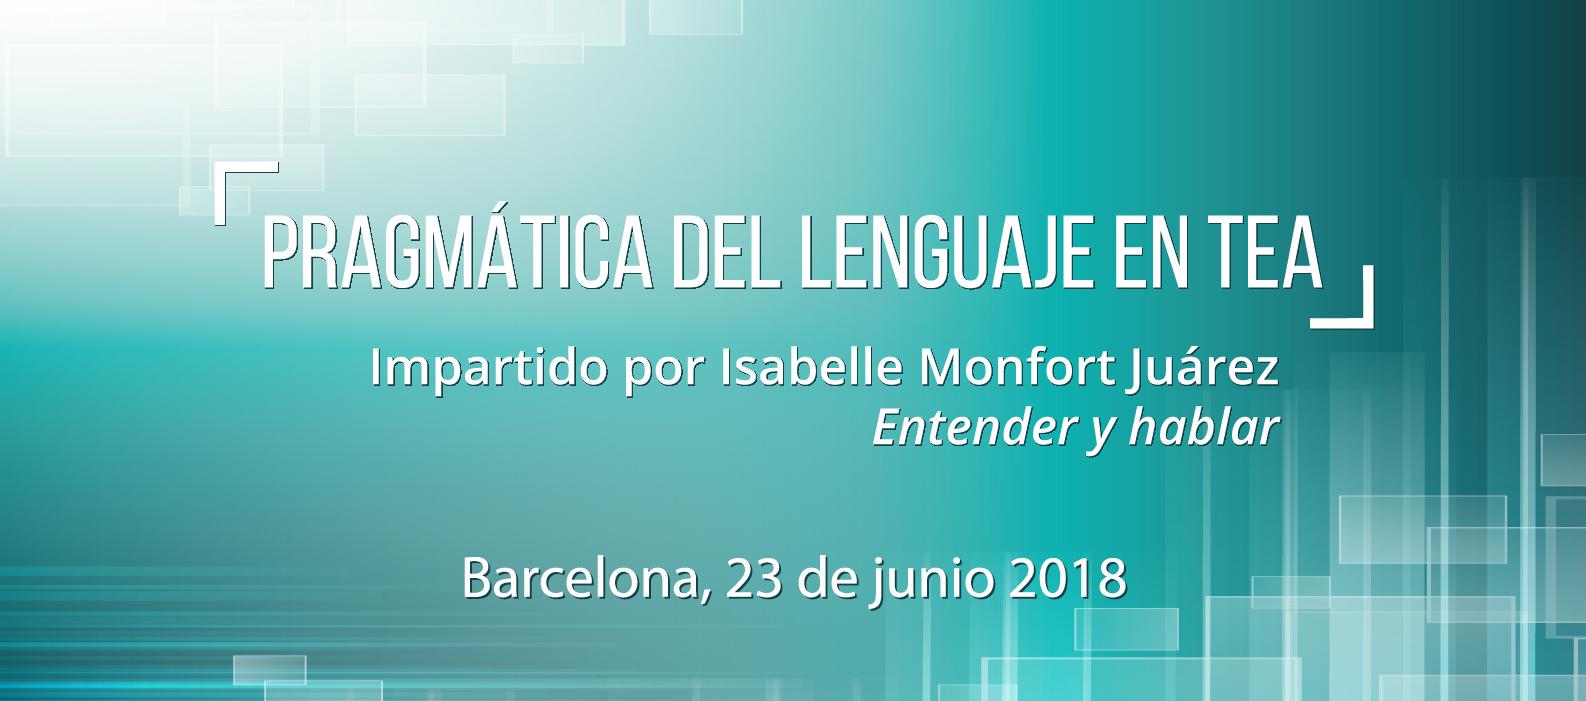 Pragmática del Lenguaje en TEA-Barcelona